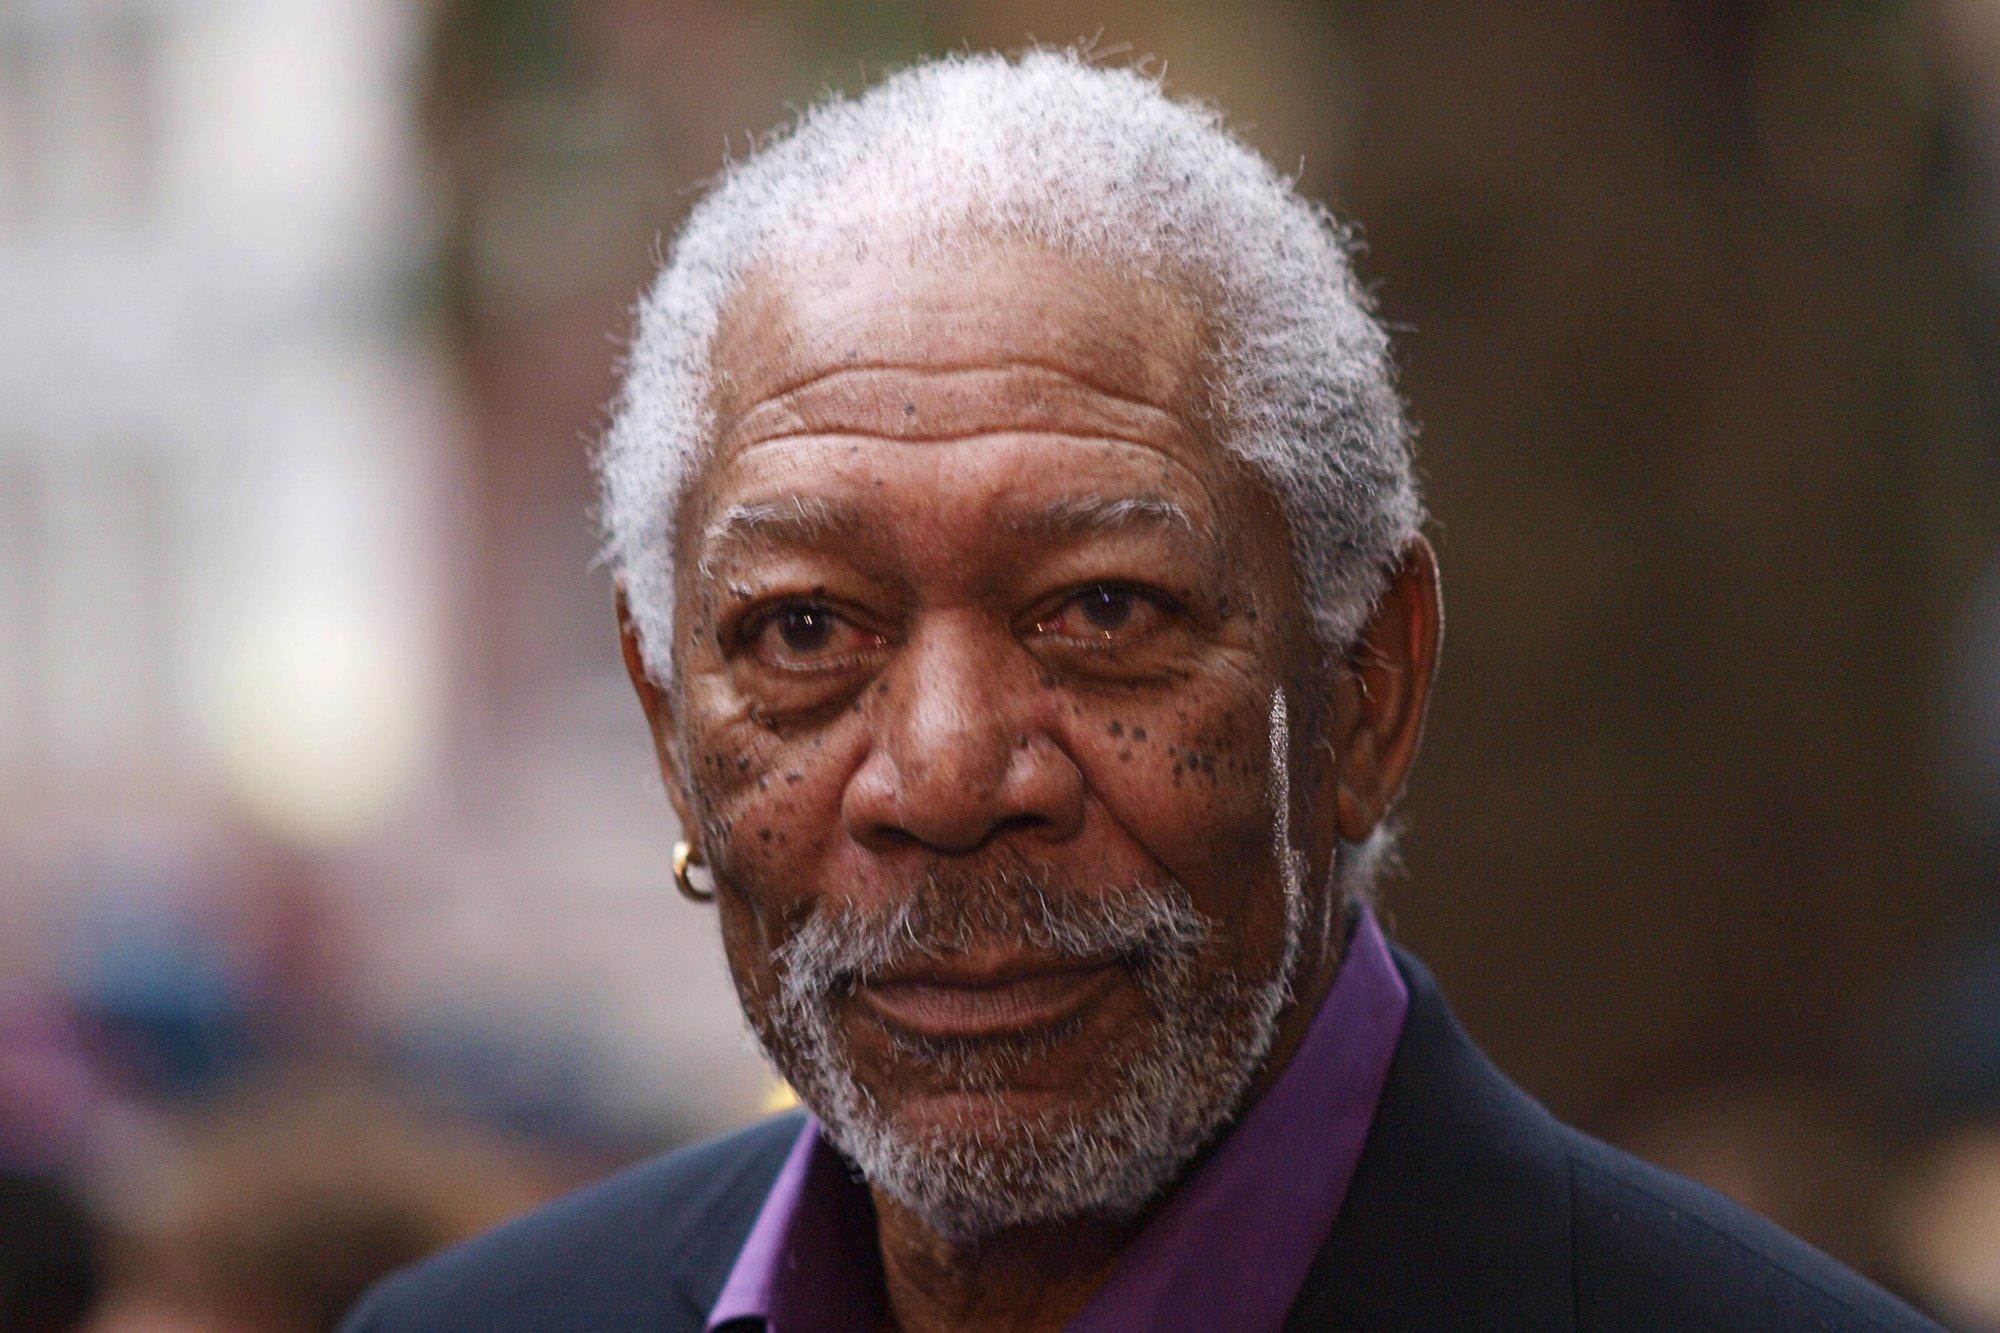 Morgan Freeman on God, Satan, and How the Human Race Has 'Become A Parasite' - The Daily Beast